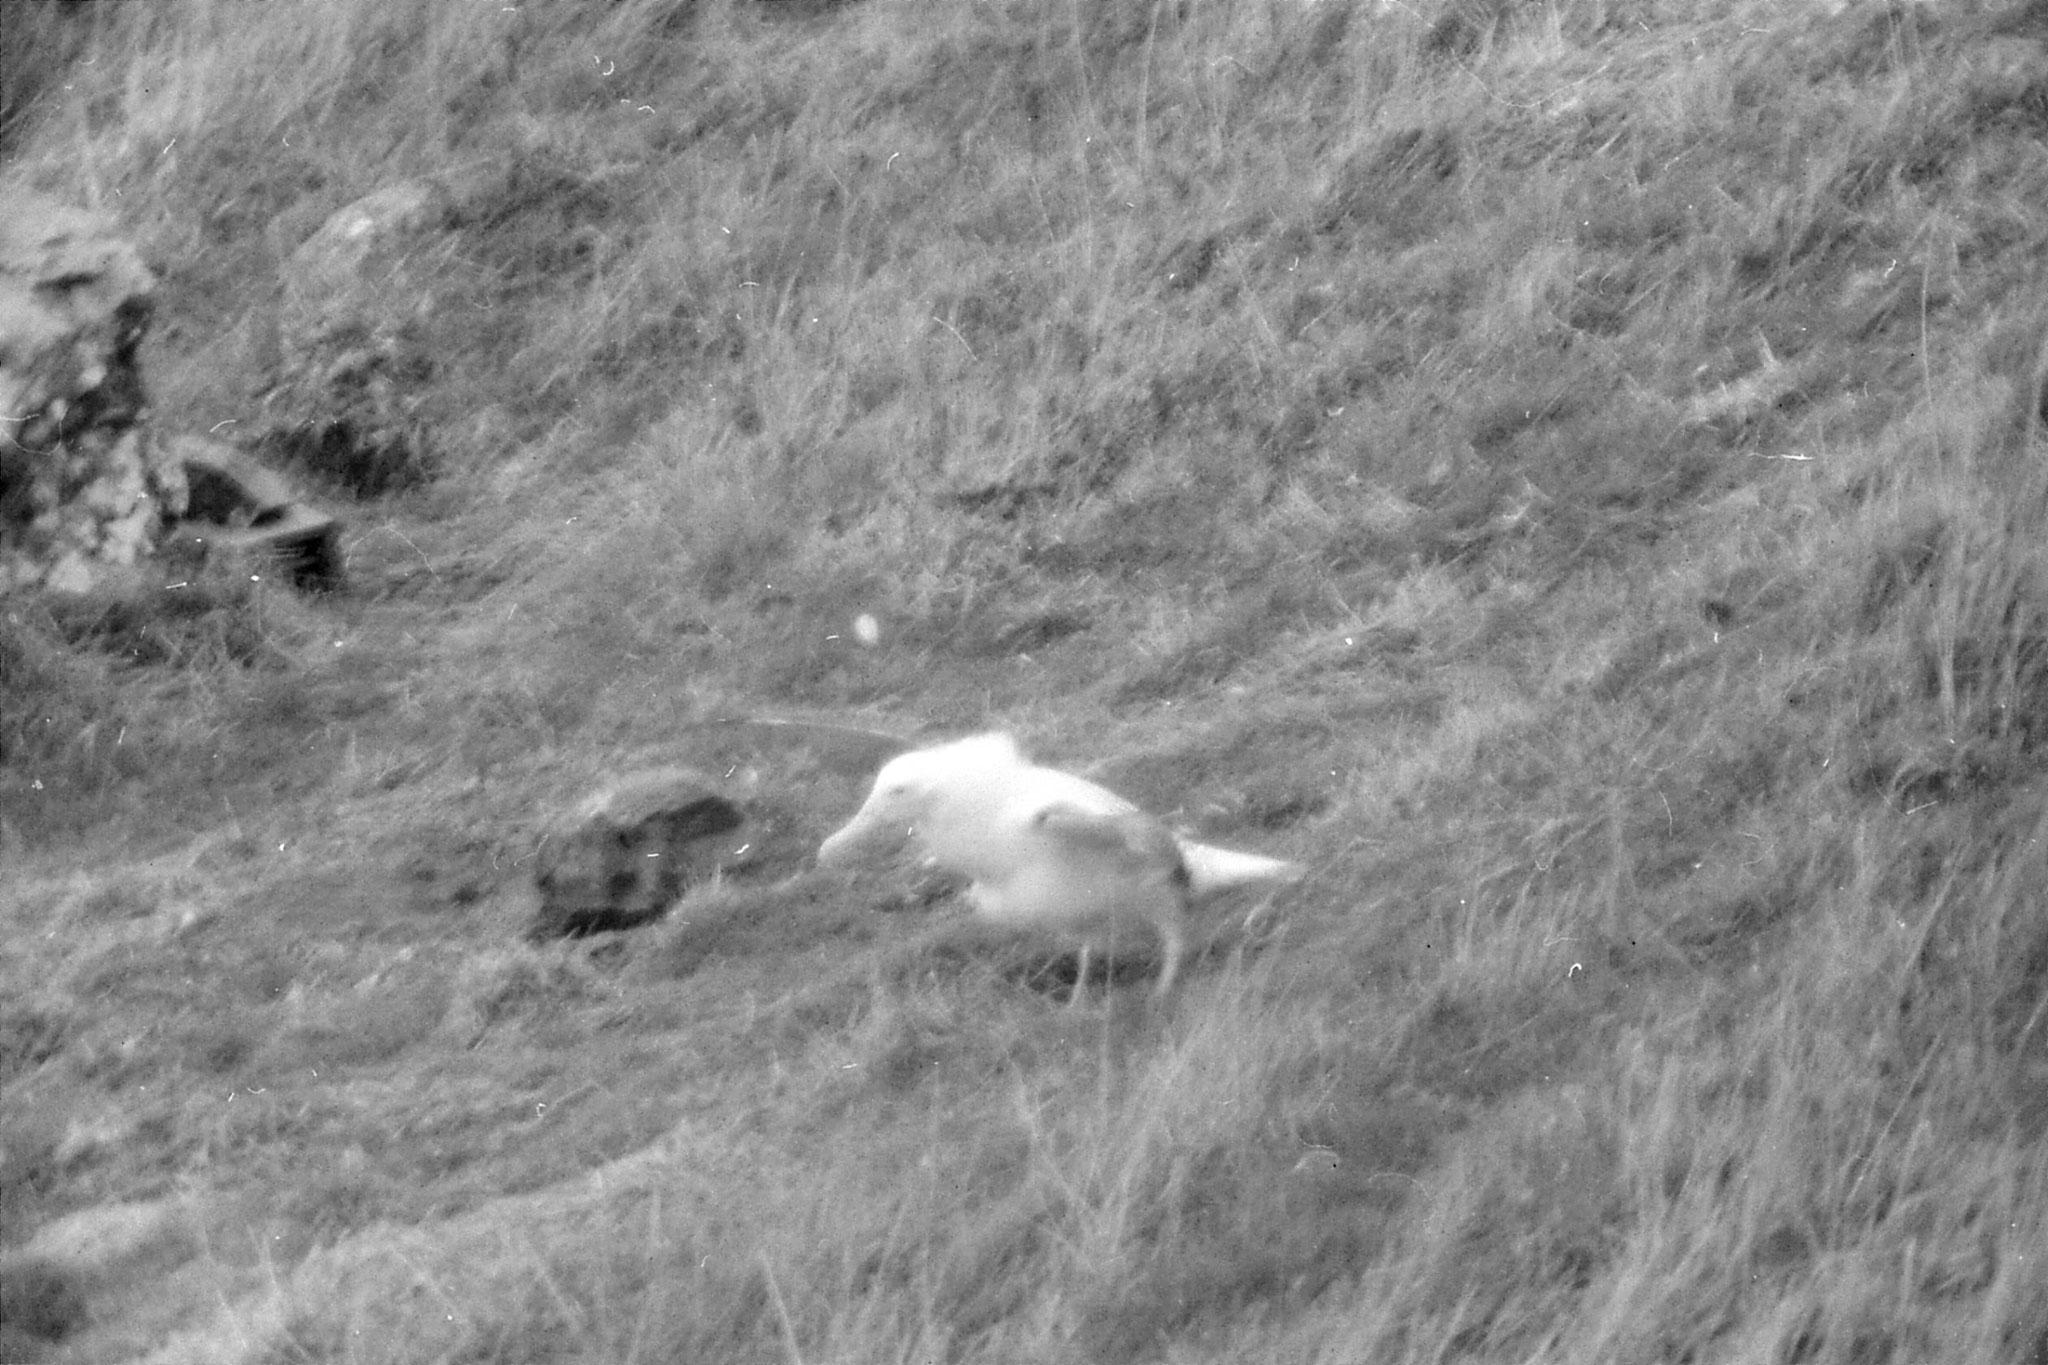 19/8/1990: 21: Dunedin albatross colony